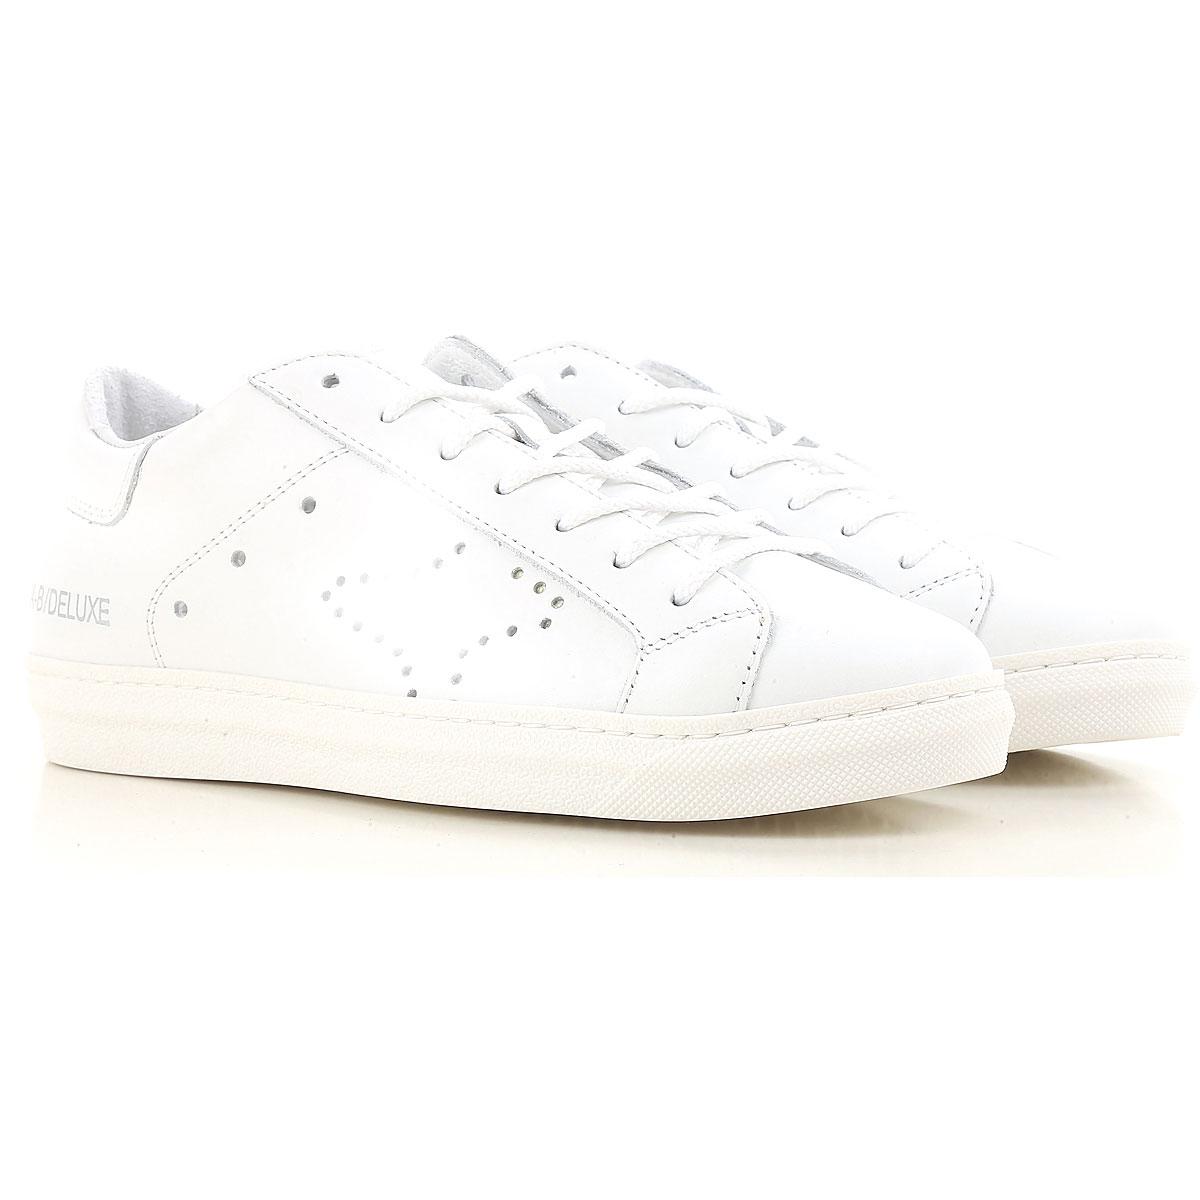 Ama Brand Sneaker Femme, Blanc, Cuir, 2017, 36 37 38 39 40